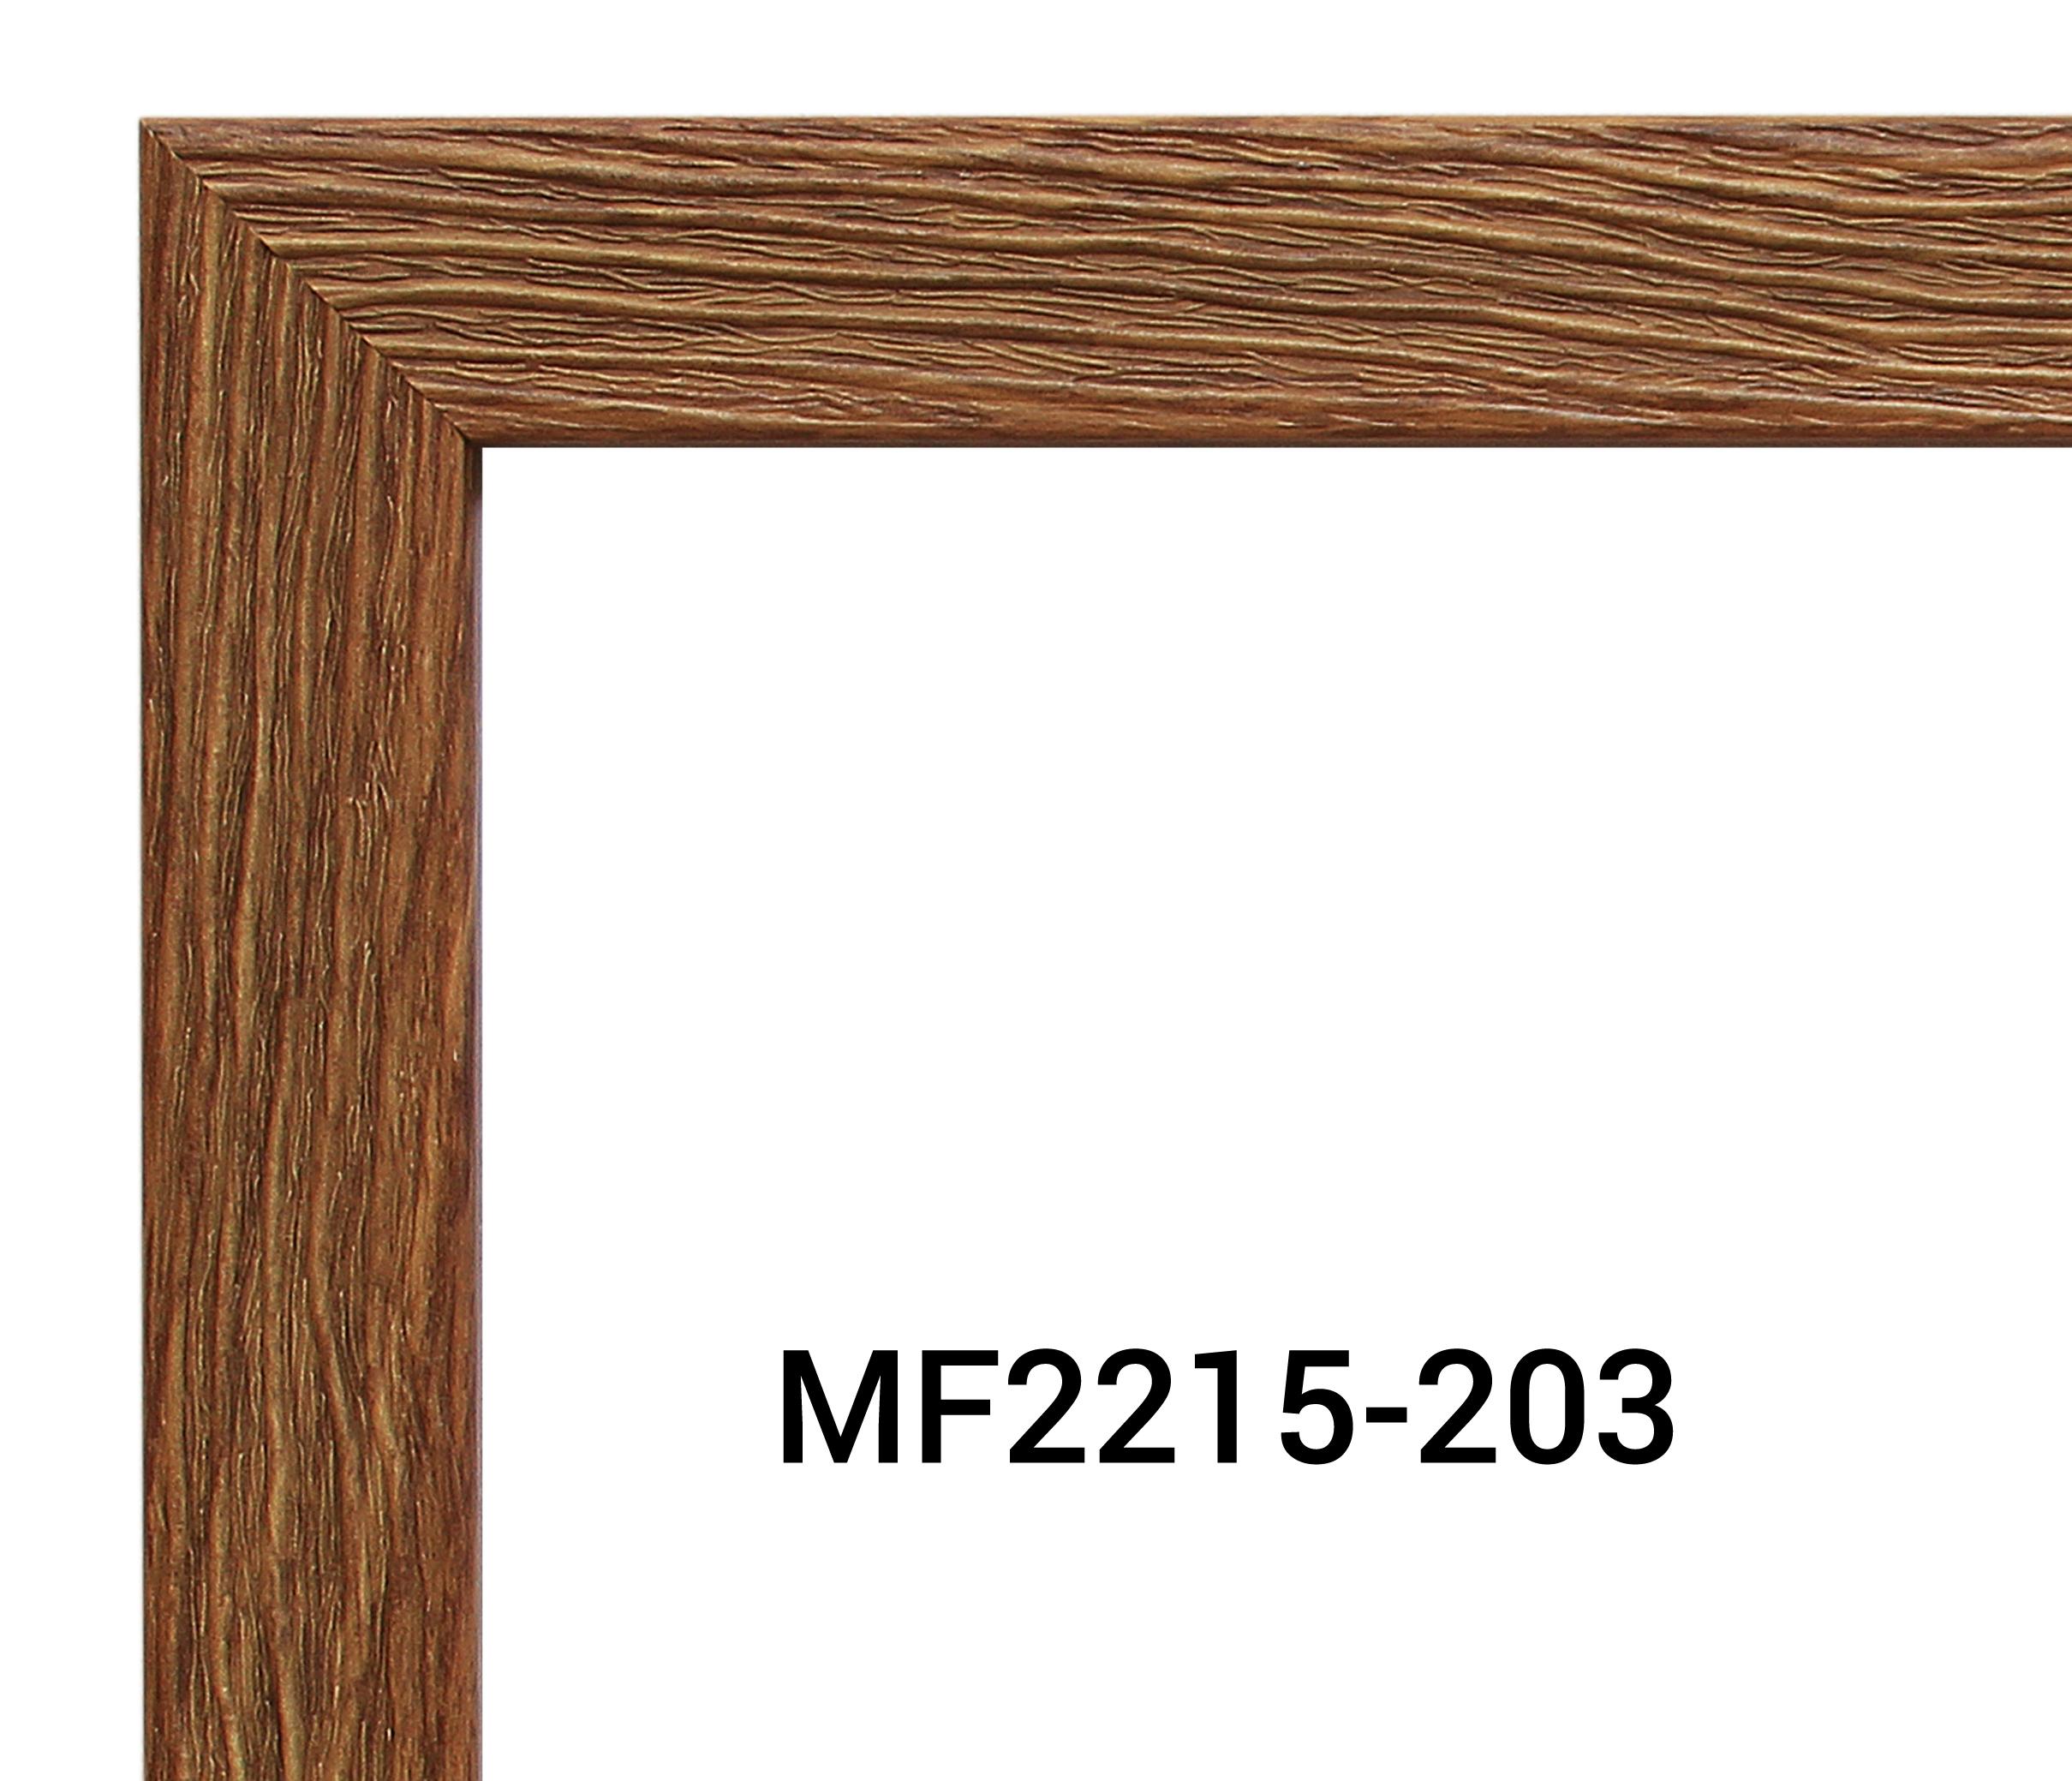 Рамка 2215-203